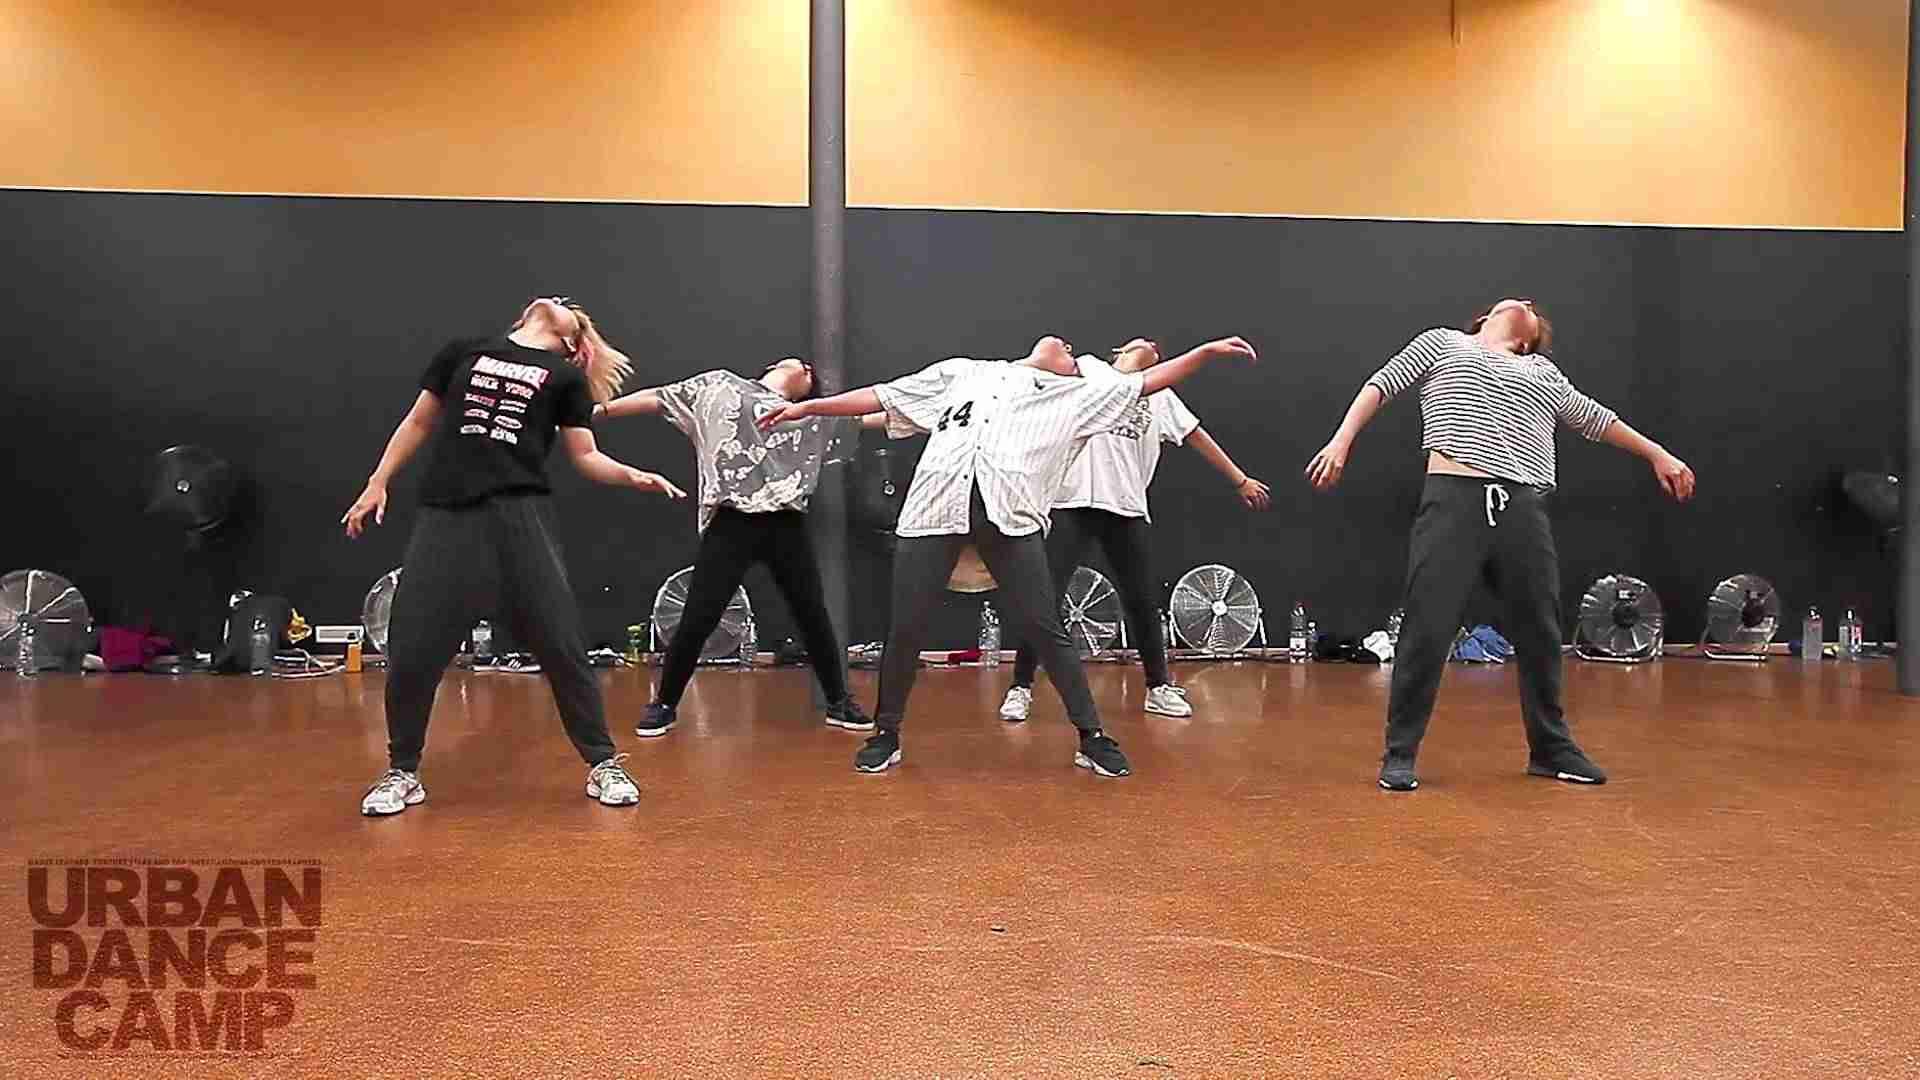 Urban dance camp 2015 koharu sugawara dating